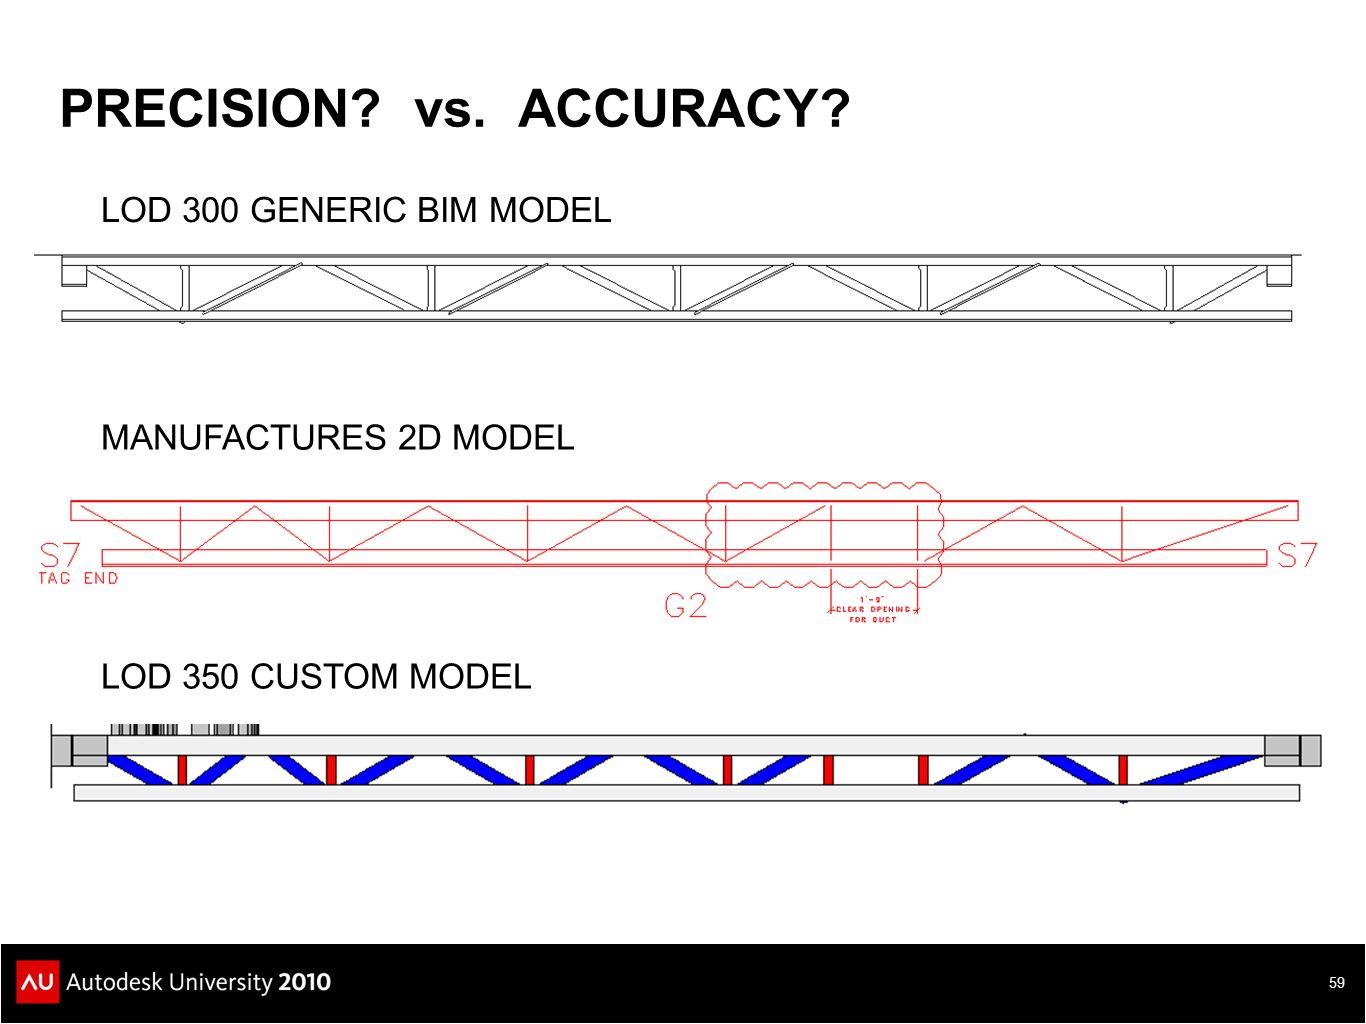 PRECISION? vs. ACCURACY? 59 LOD 300 GENERIC BIM MODEL MANUFACTURES 2D MODEL LOD 350 CUSTOM MODEL